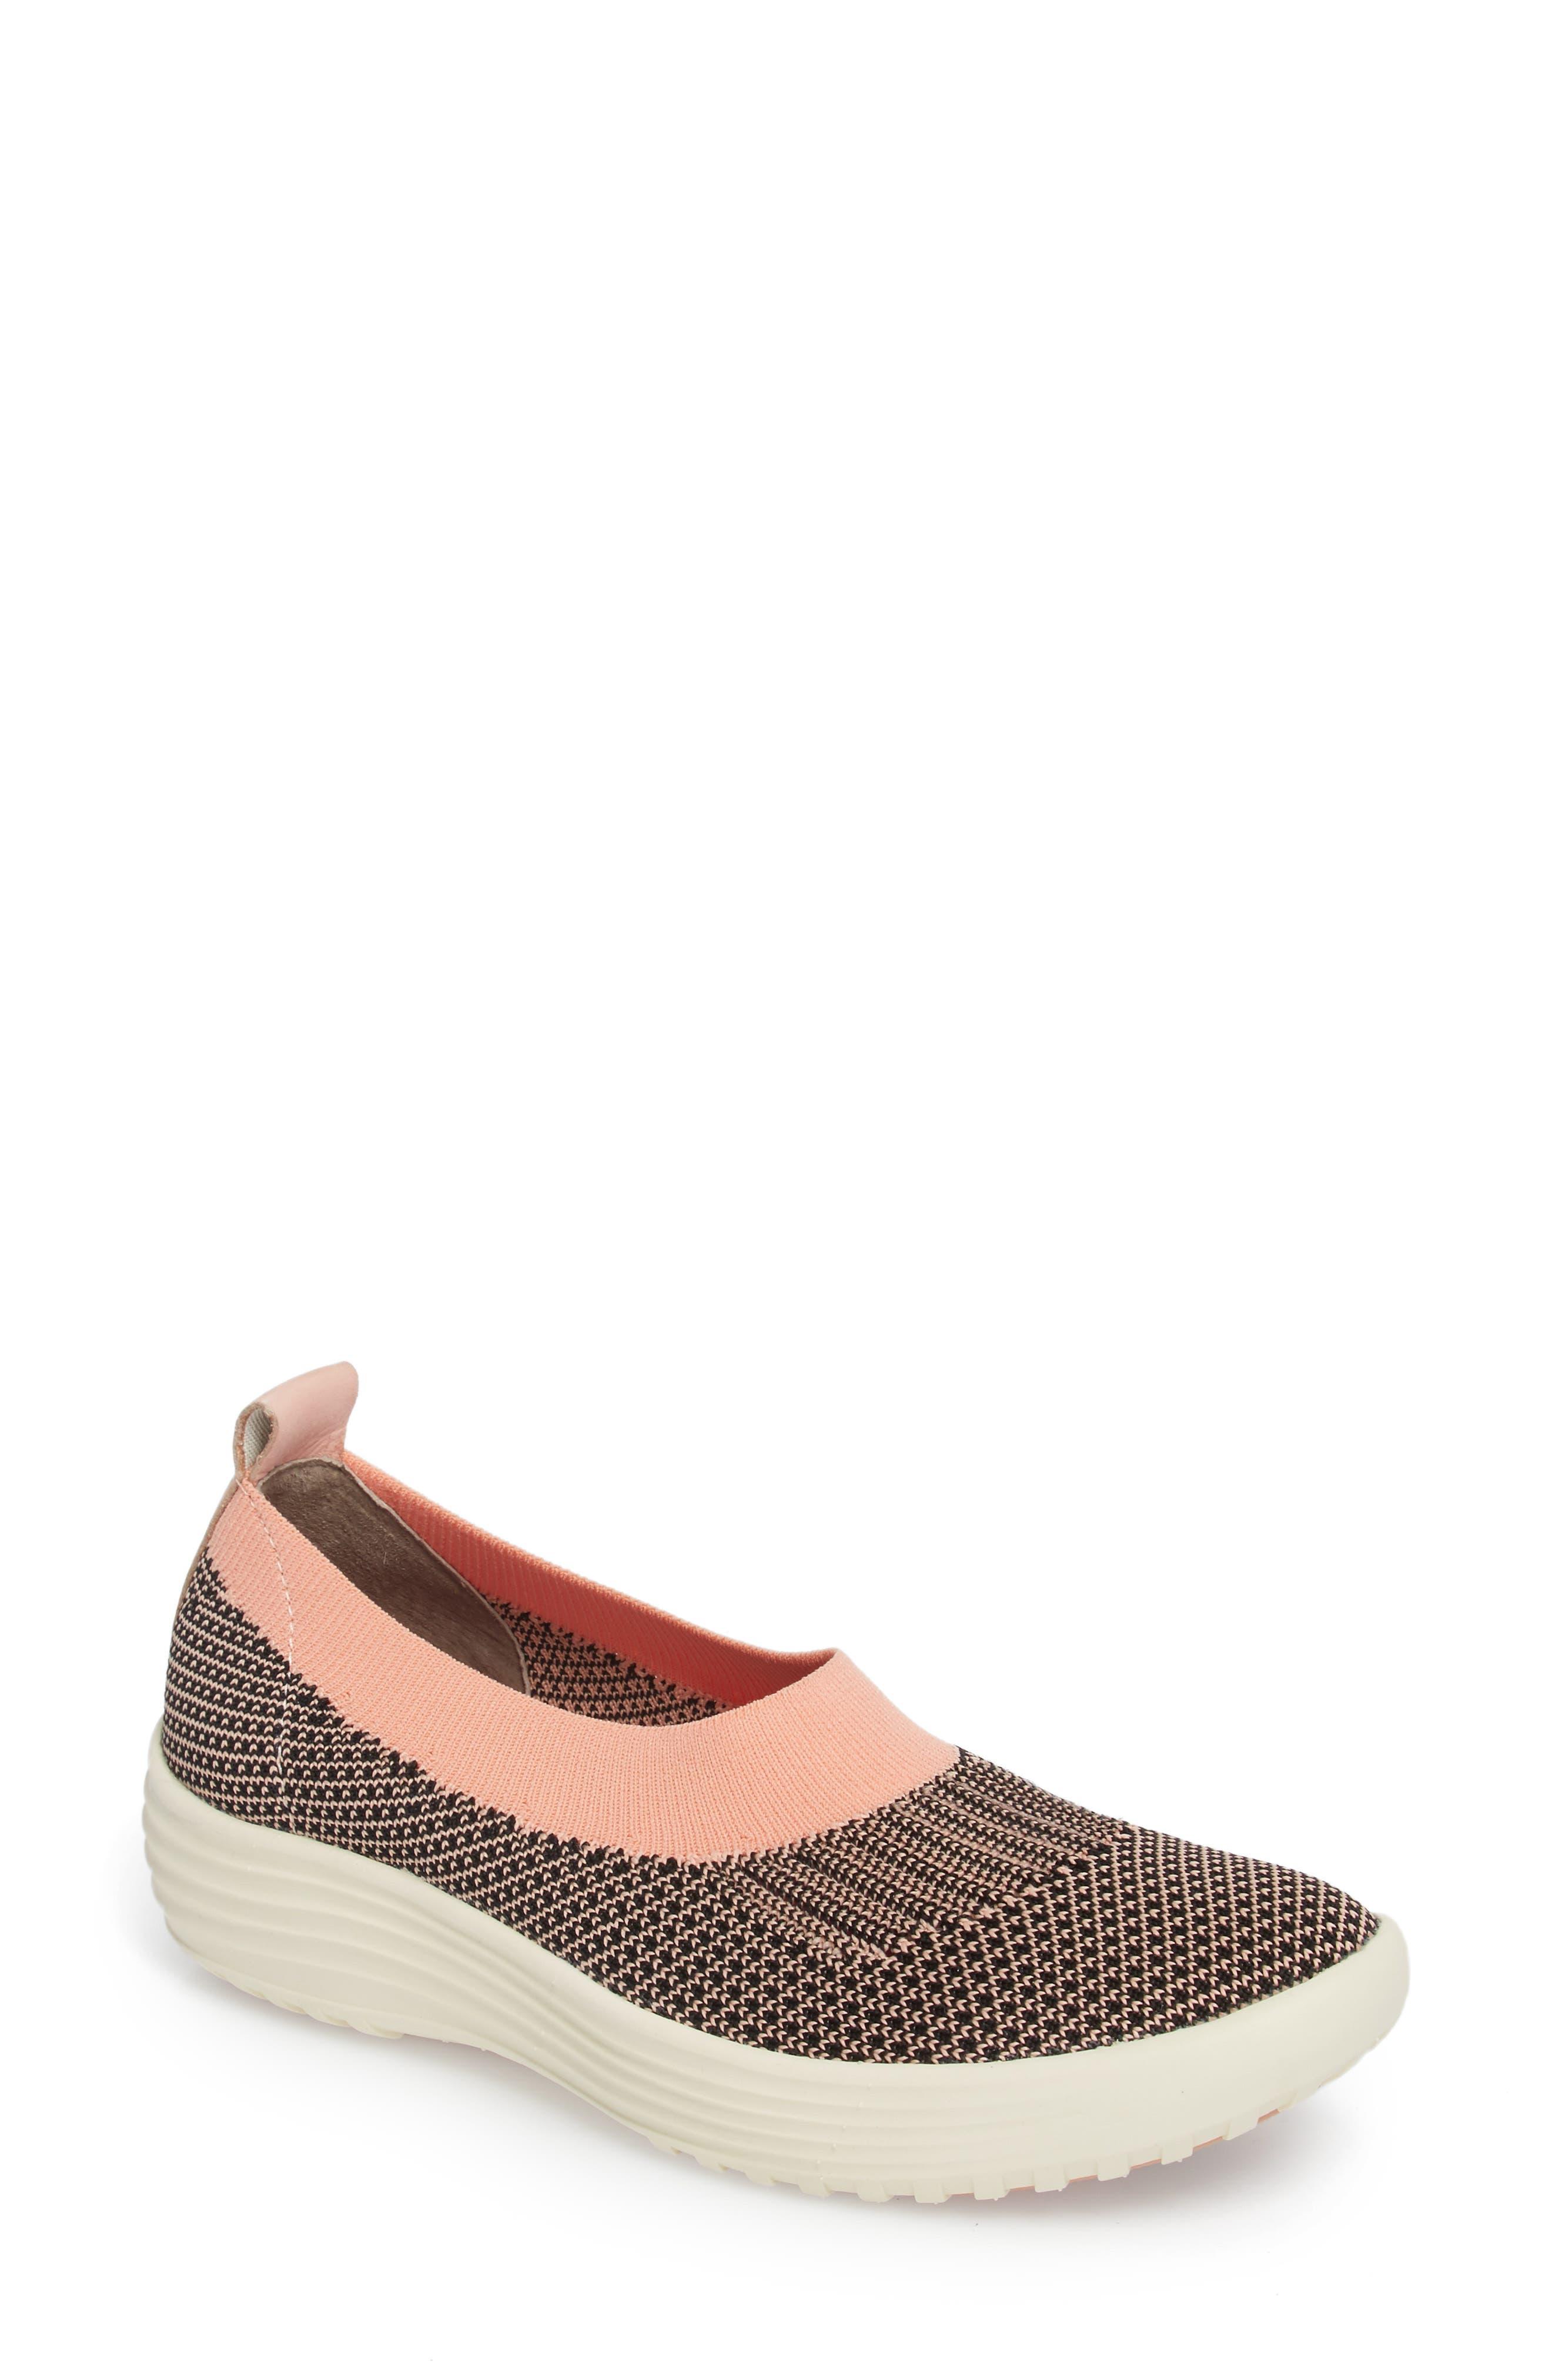 Merigold Slip-On Sock Fit Sneaker,                             Main thumbnail 1, color,                             Pink/ Black Knit Fabric